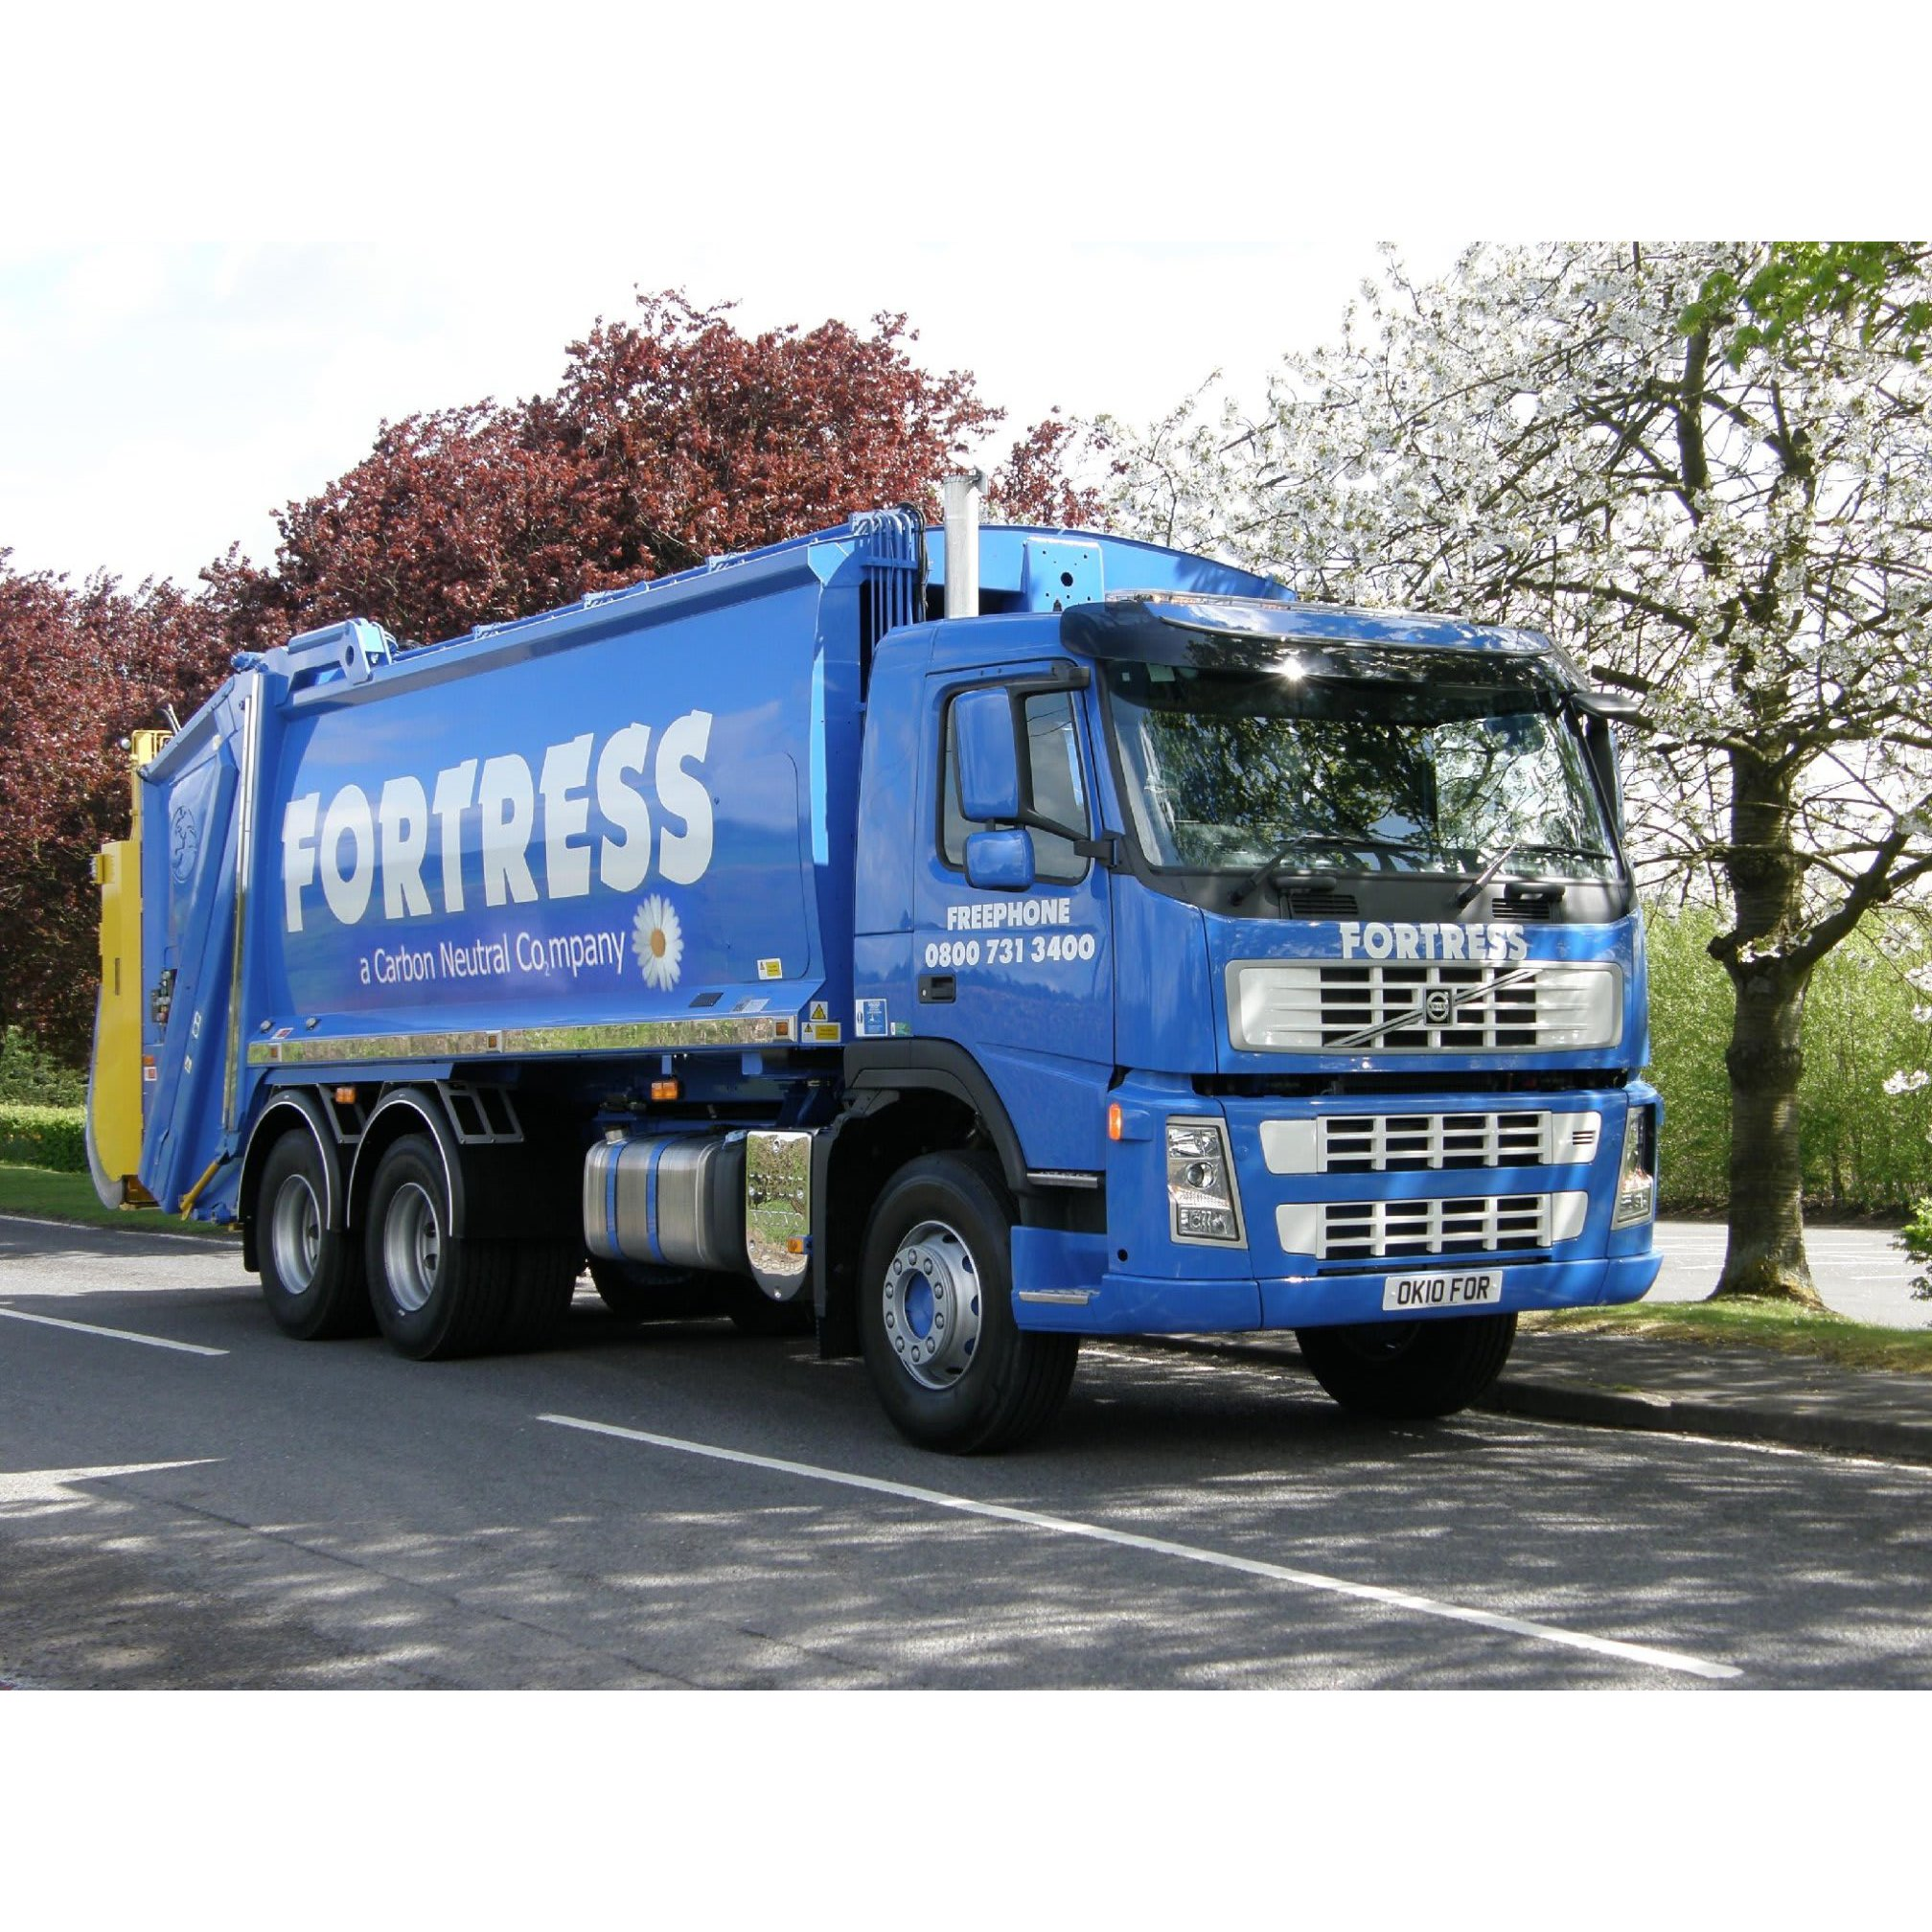 Fortress Recycling Resource Management Ltd - Warwick, Warwickshire CV34 6TA - 01926 493414 | ShowMeLocal.com